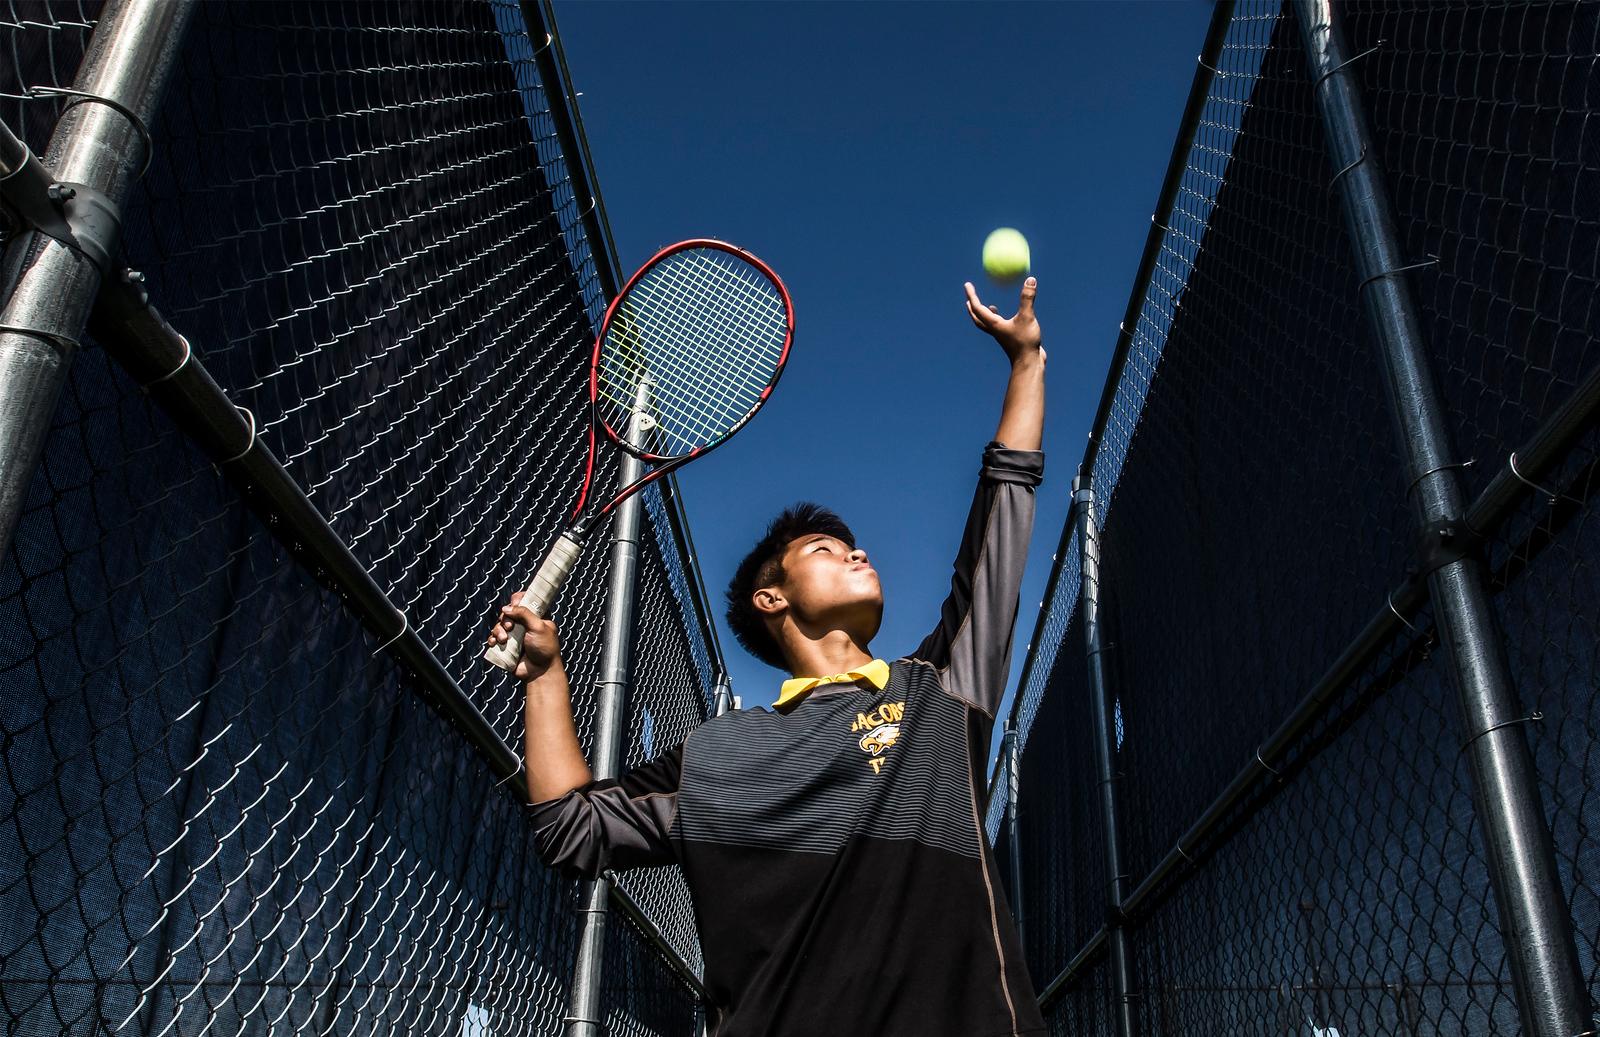 hspts_adv_POY_Tennis_01.jpg